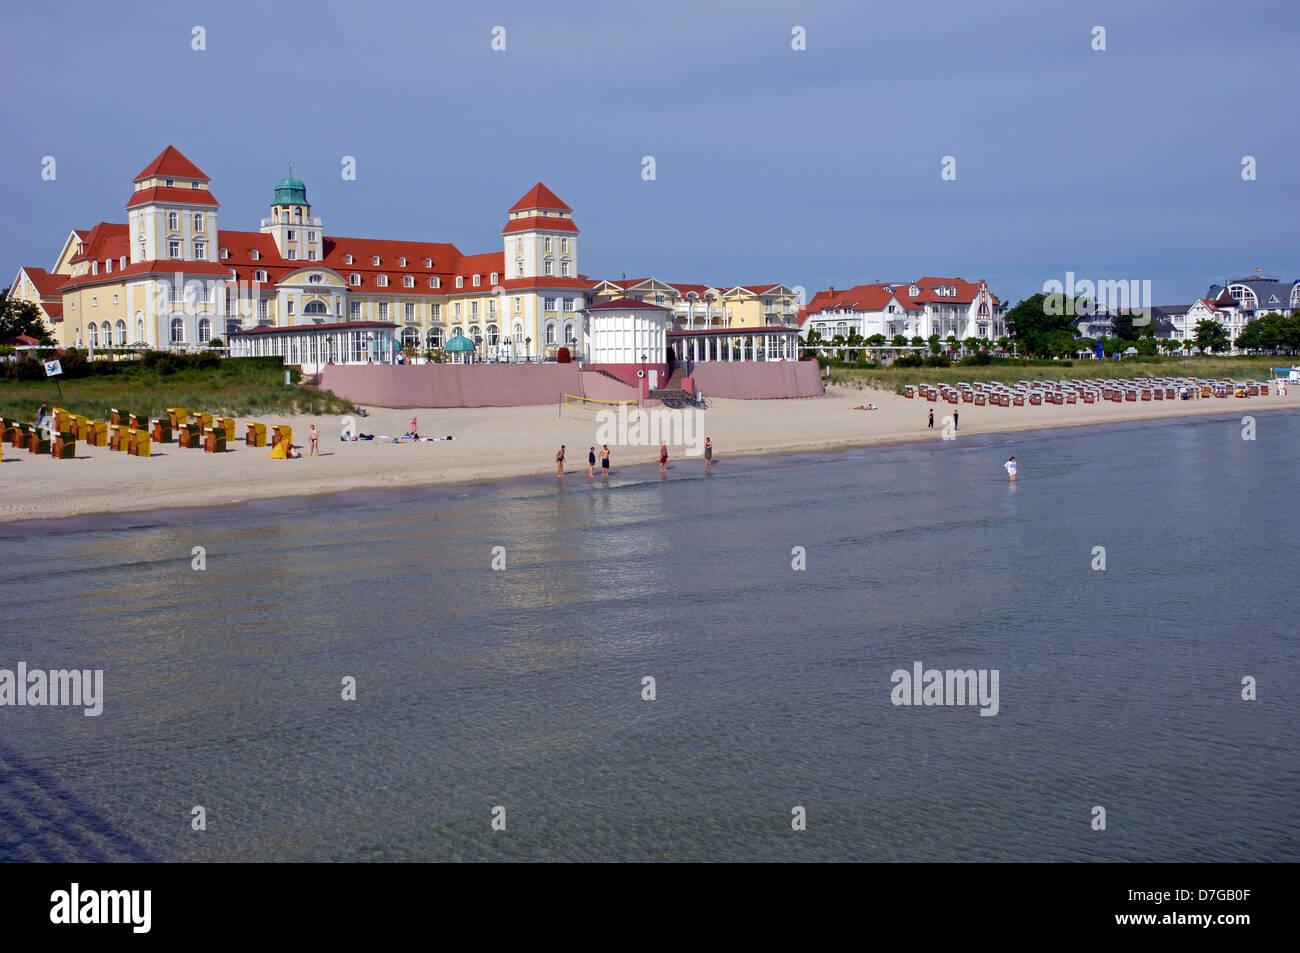 Germany, Mecklenburg-West Pomerania, island Rügen, Ruegen, Binz, Baltic sea - Stock Image